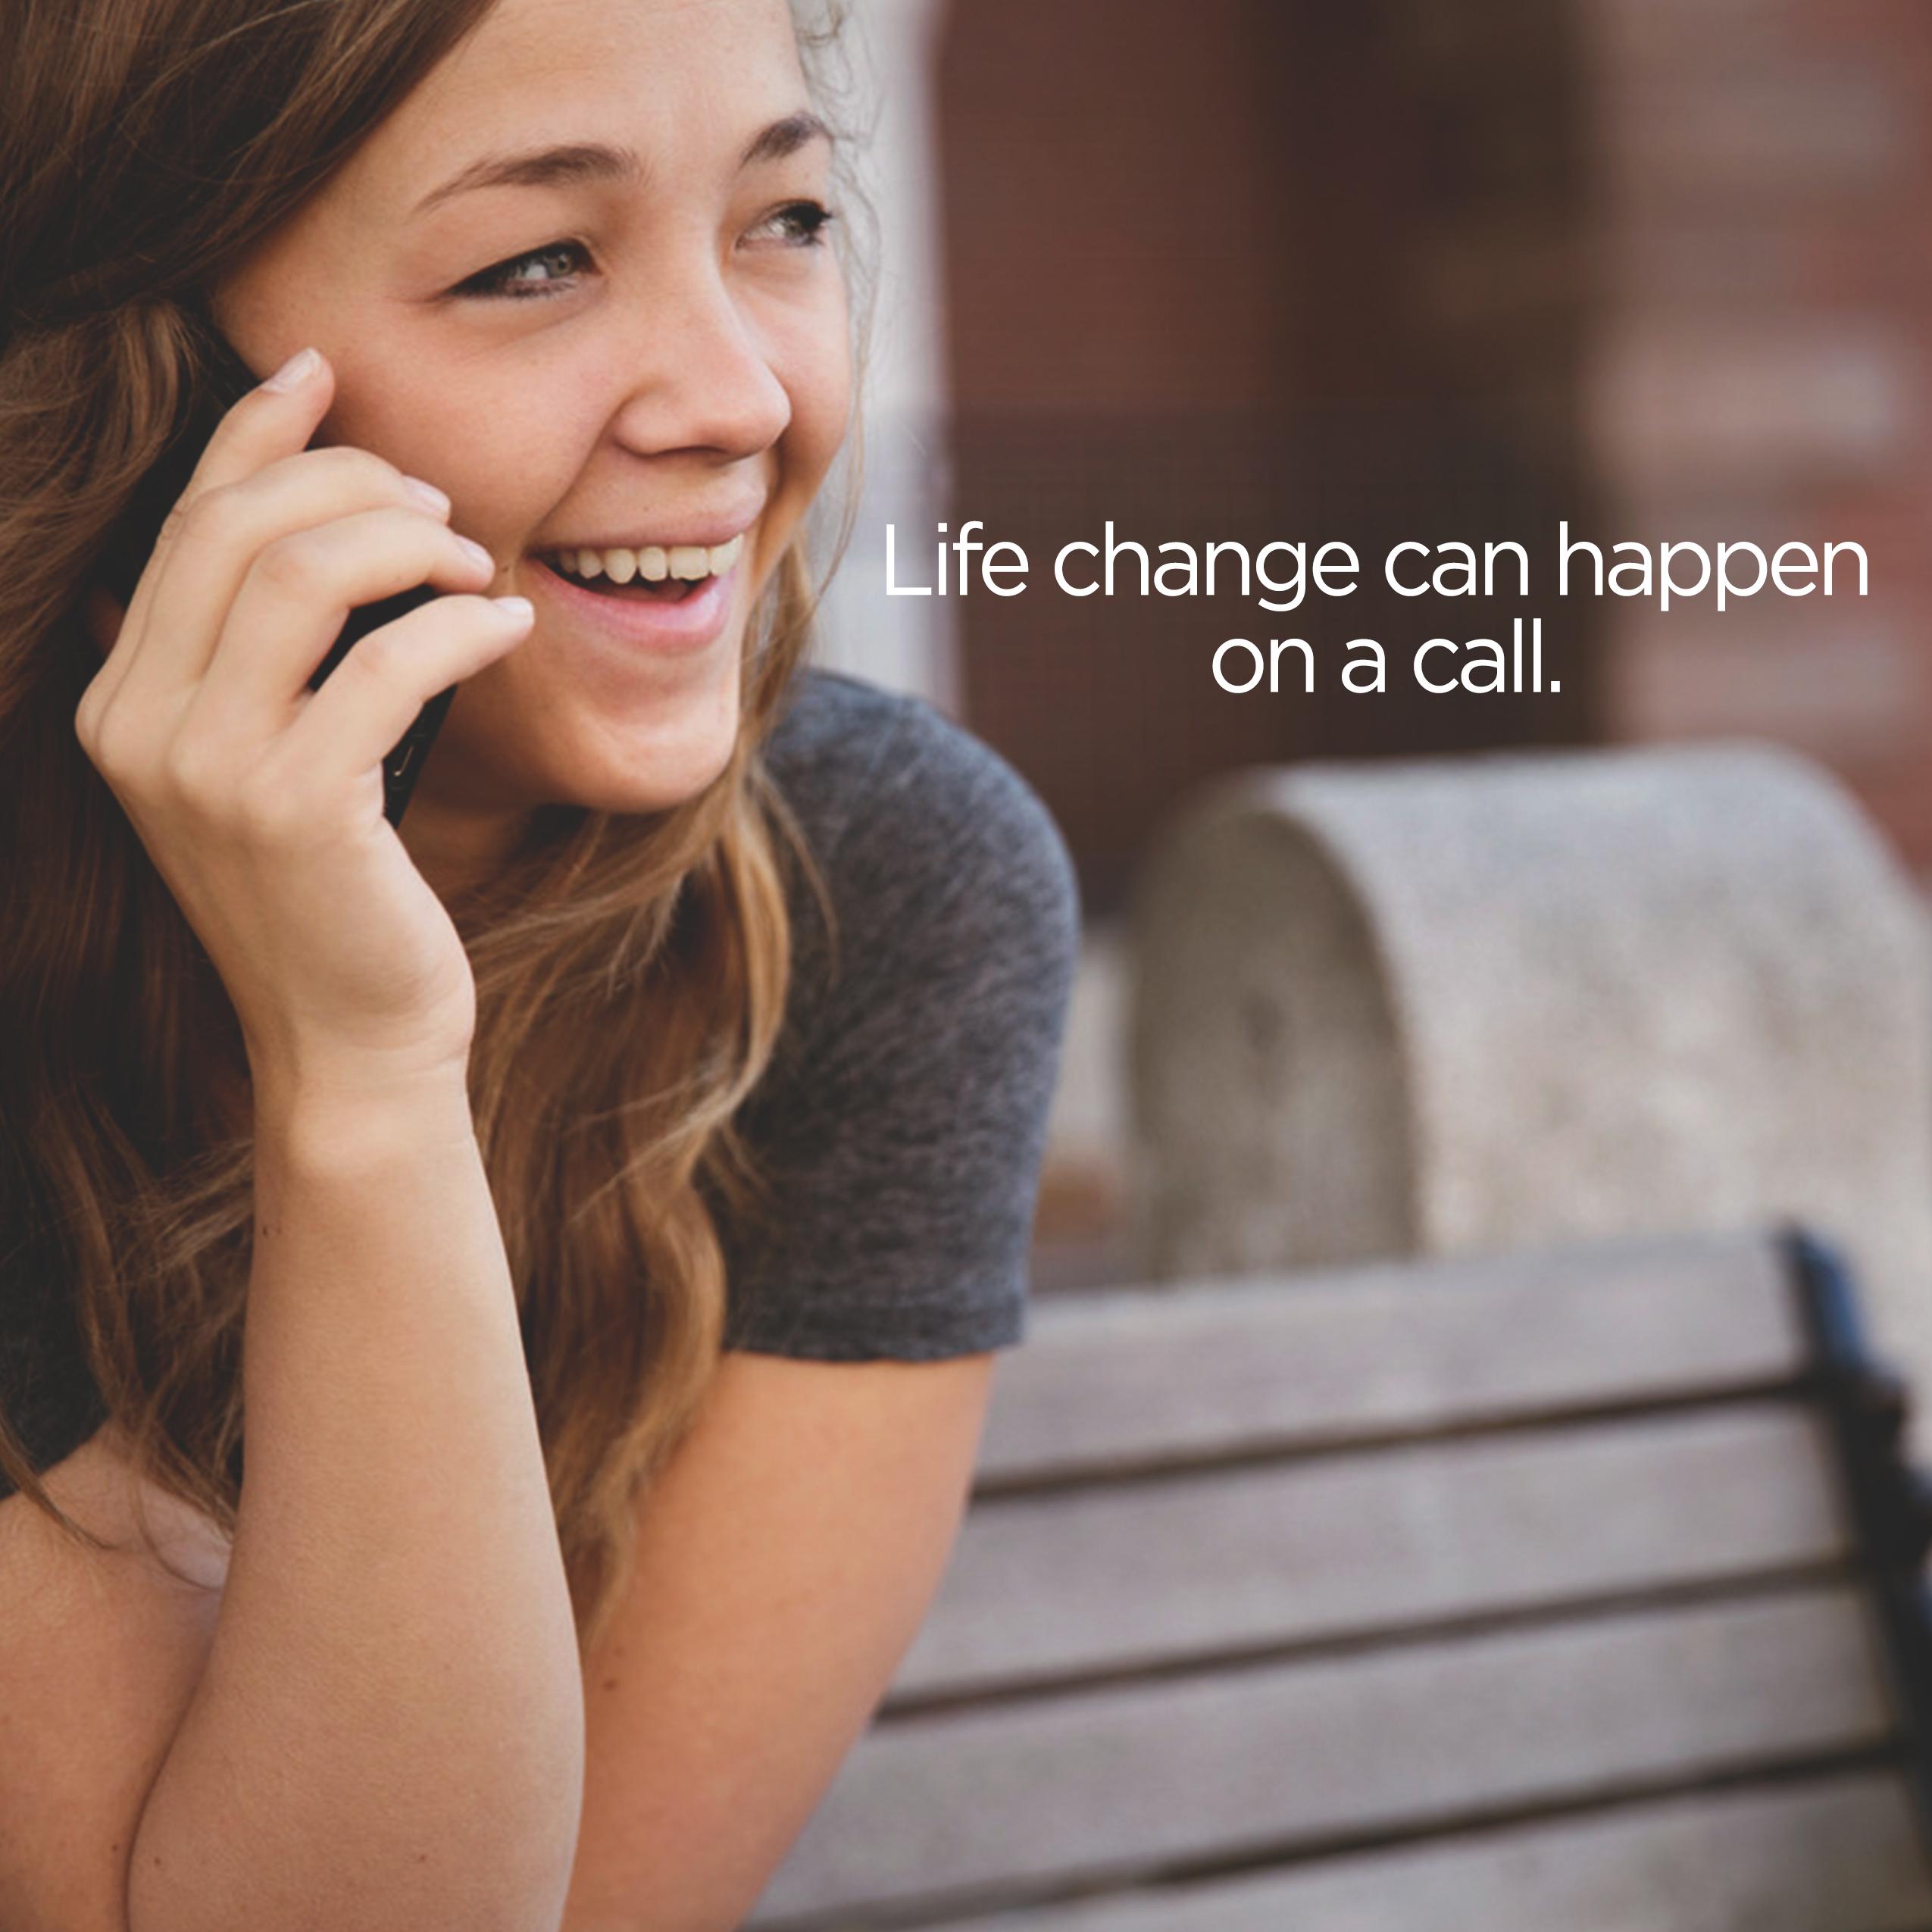 Call (JPG)